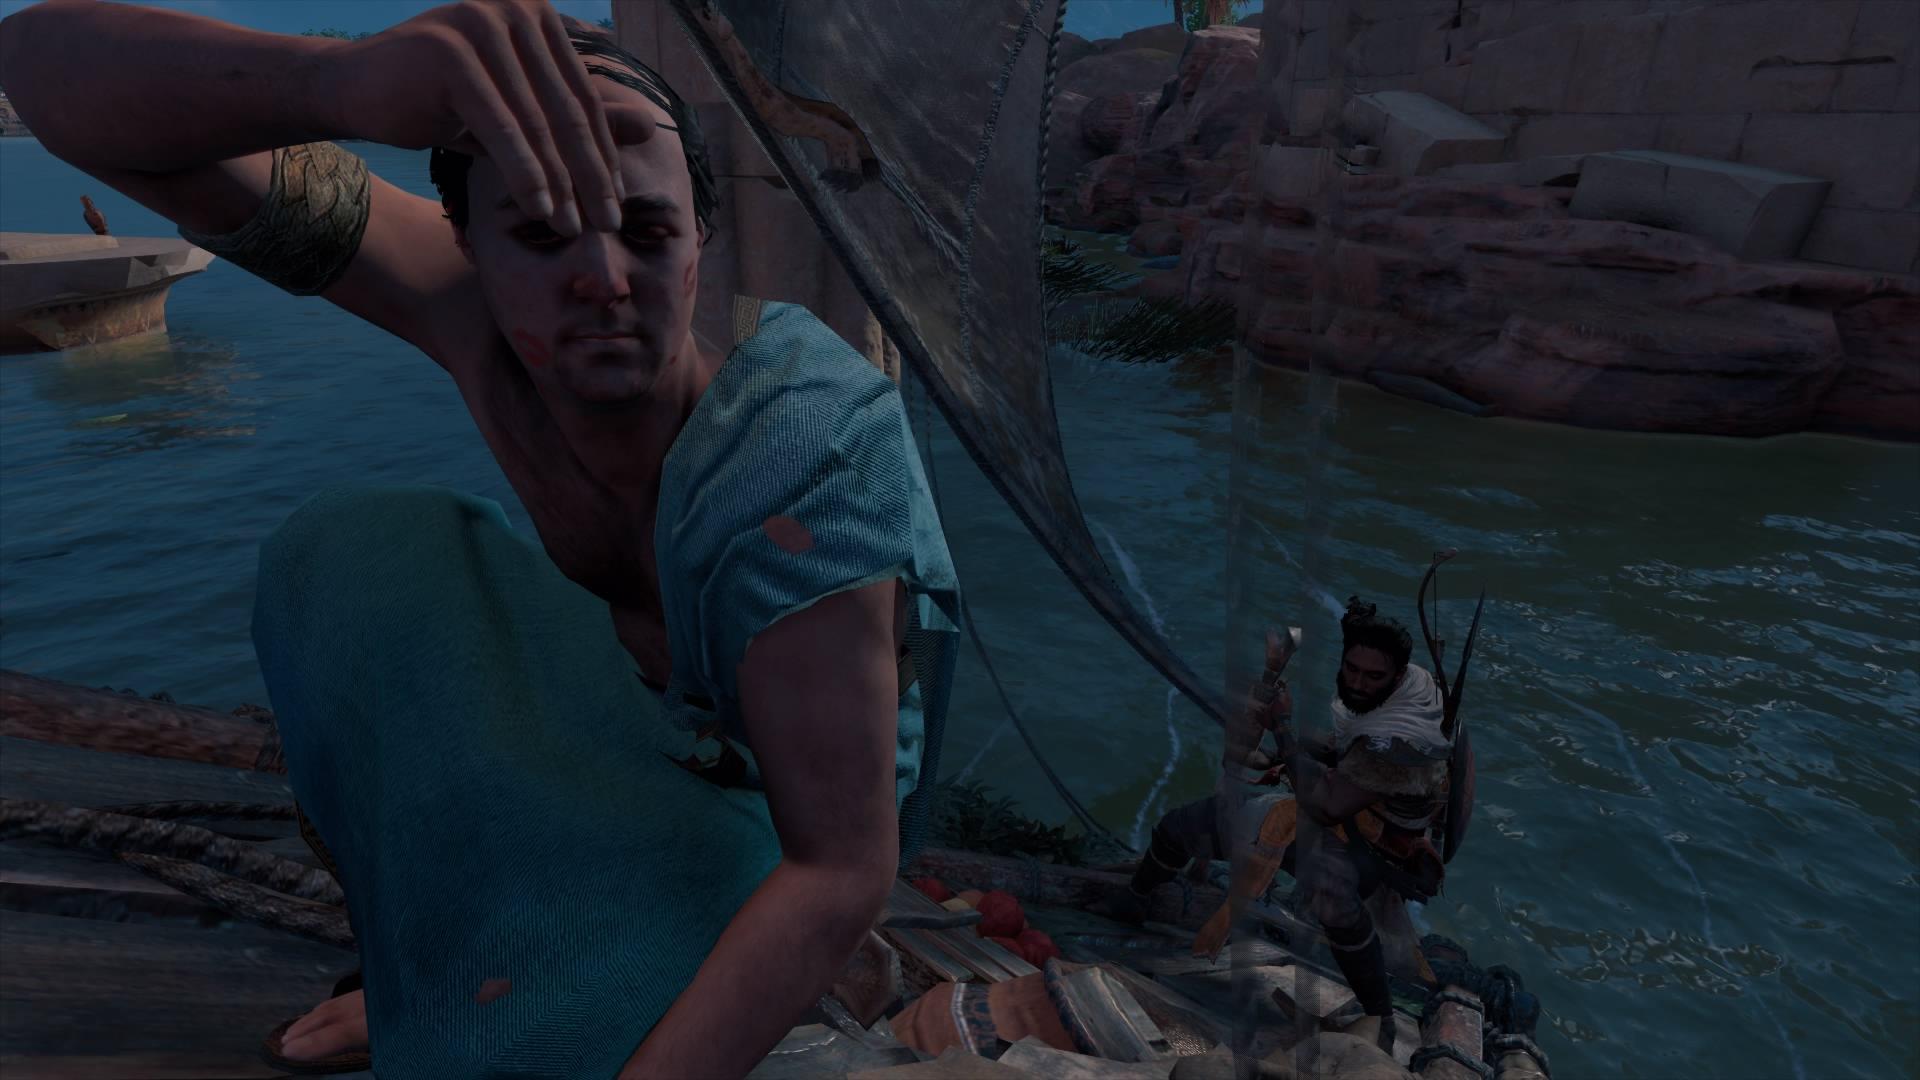 Assassin's Creed® Истоки__74.jpeg - Assassin's Creed: Origins